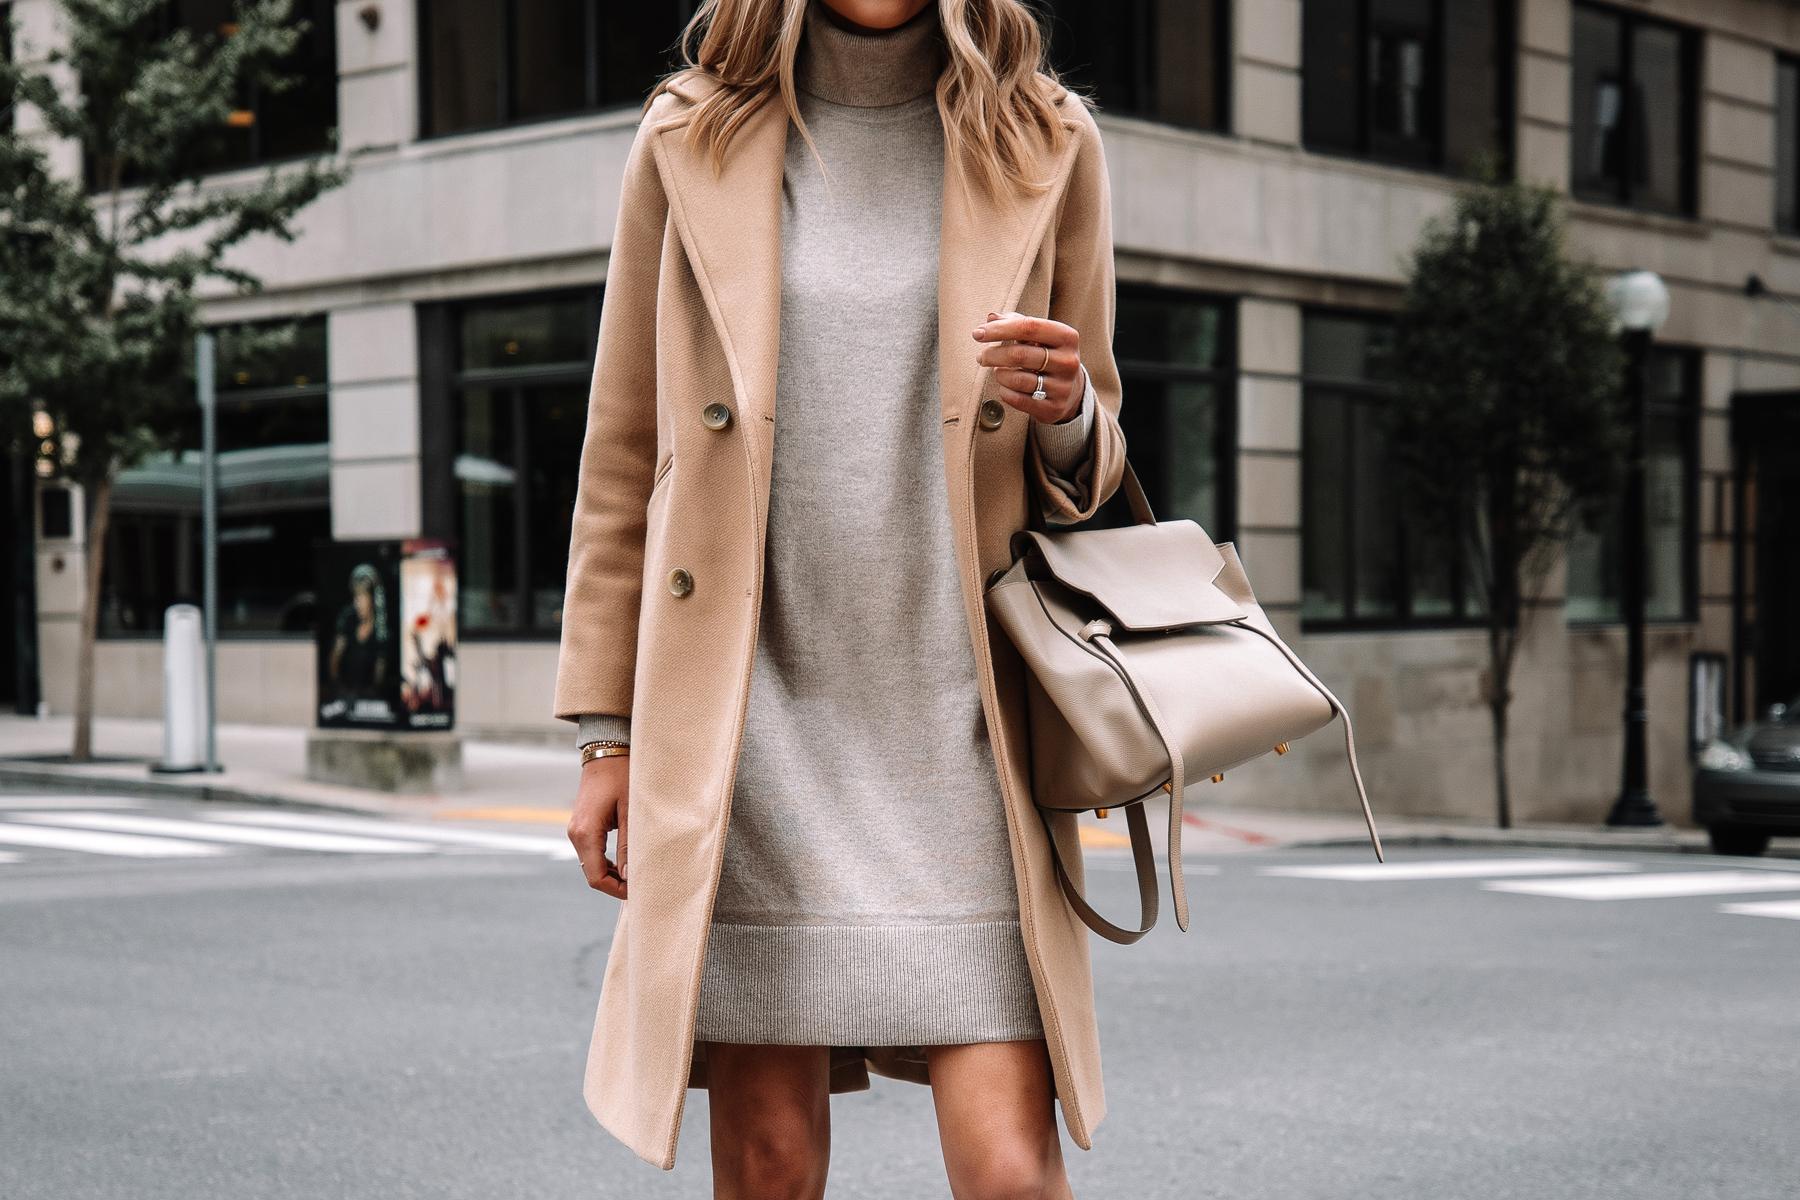 Fashion Jackson Wearing Everlane Camel Coat Everlane Beige Sweater Dress Celine Belt Bag Fall Outfit